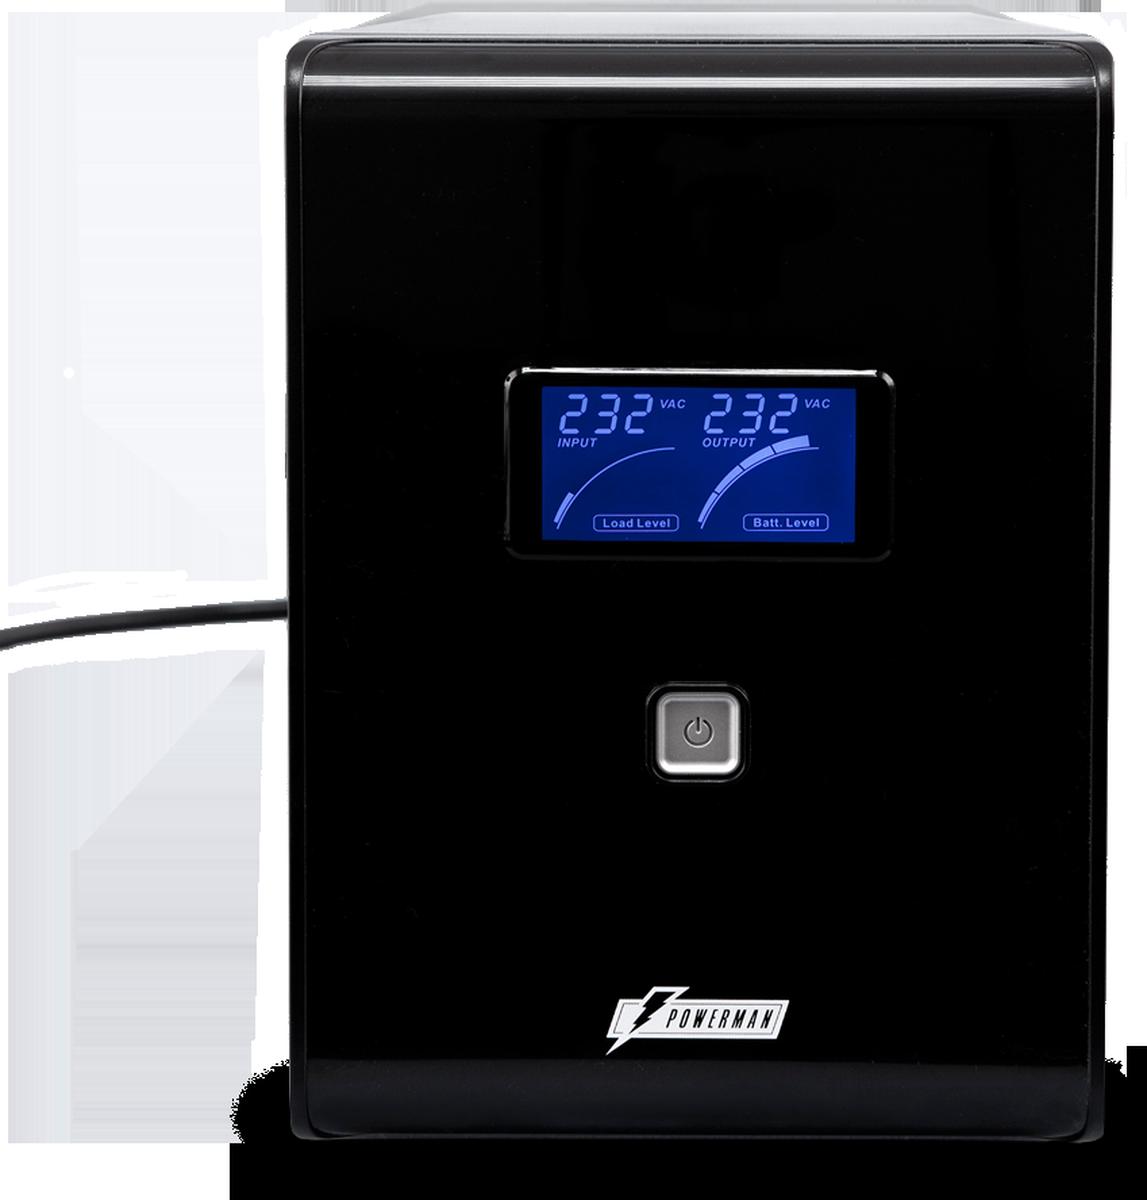 Источник бесперебойного питания Powerman UPS Smart Sine 1500, 1500 ВА источник бесперебойного питания ippon back power pro lcd 600